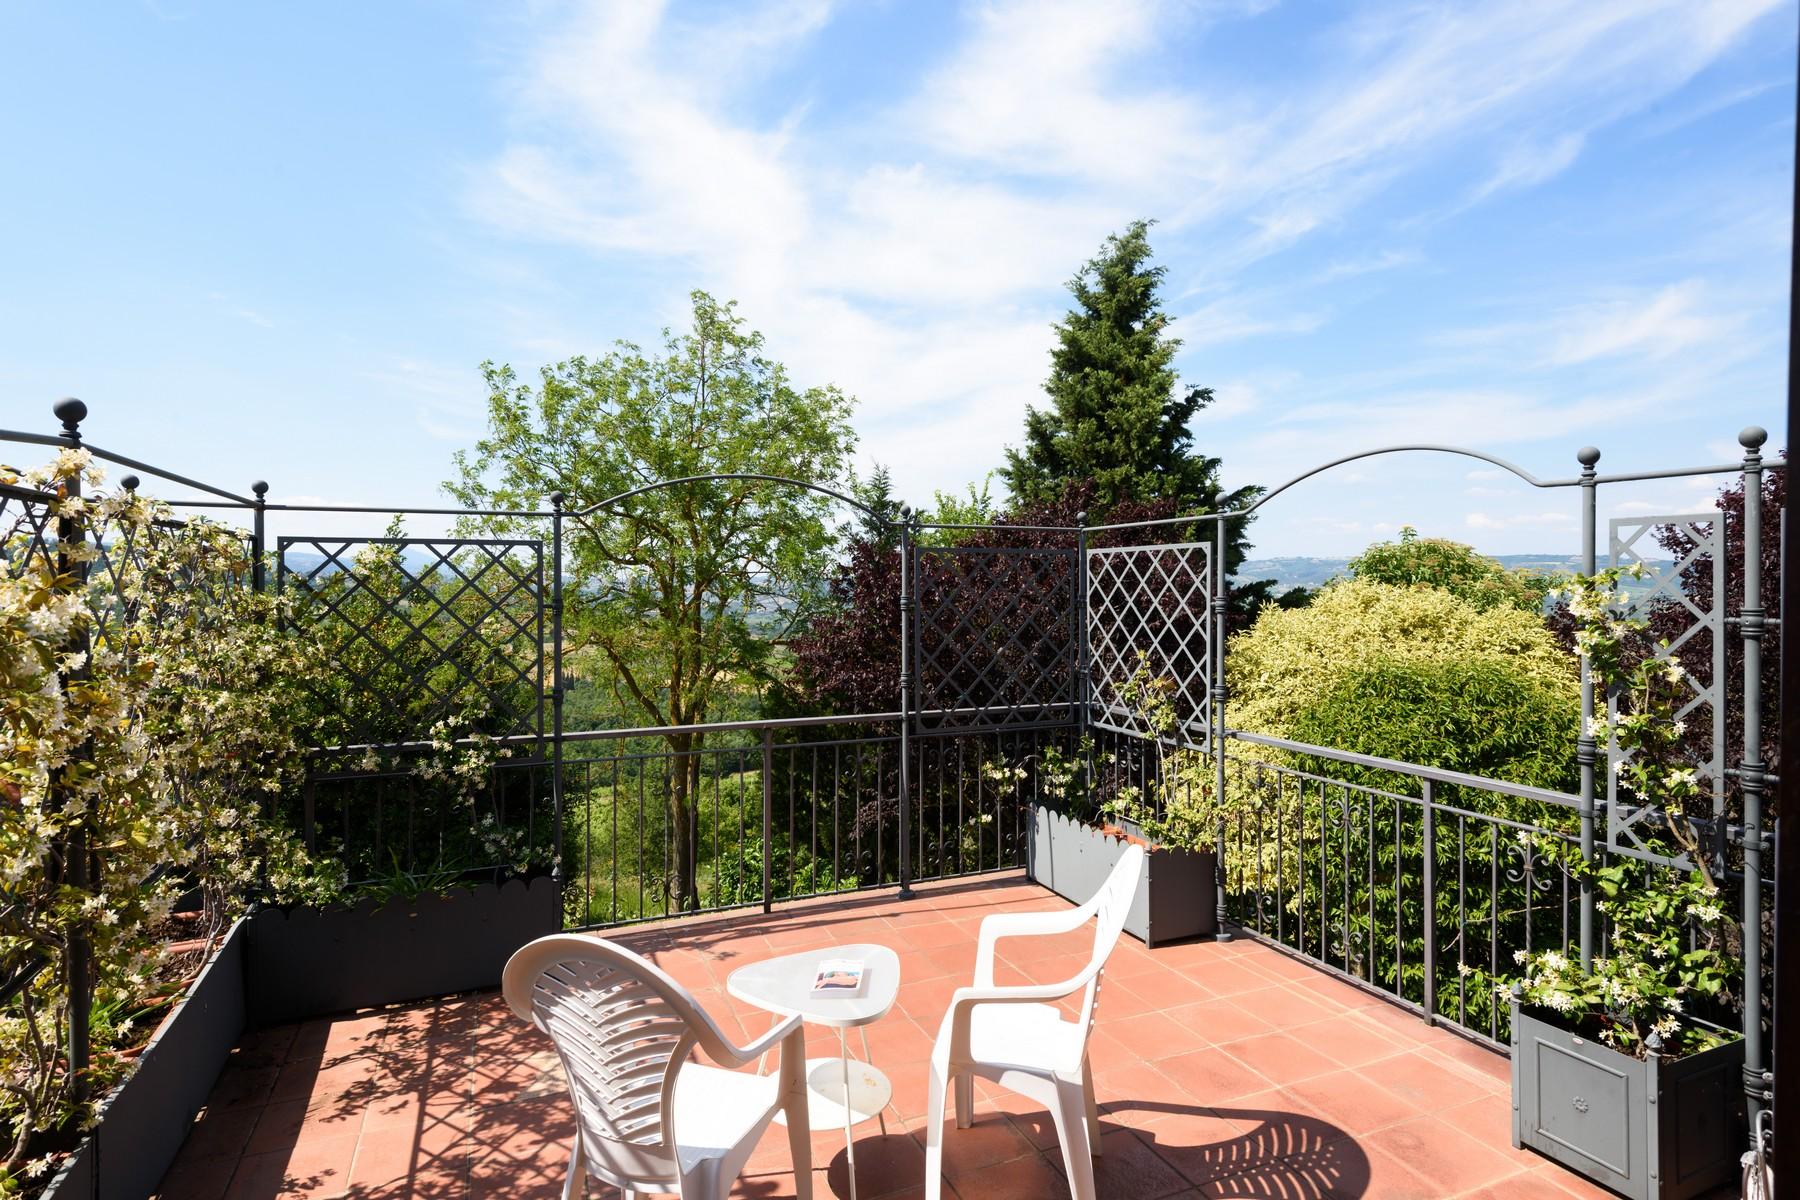 Casa indipendente in Vendita a Castel Viscardo: 5 locali, 700 mq - Foto 9